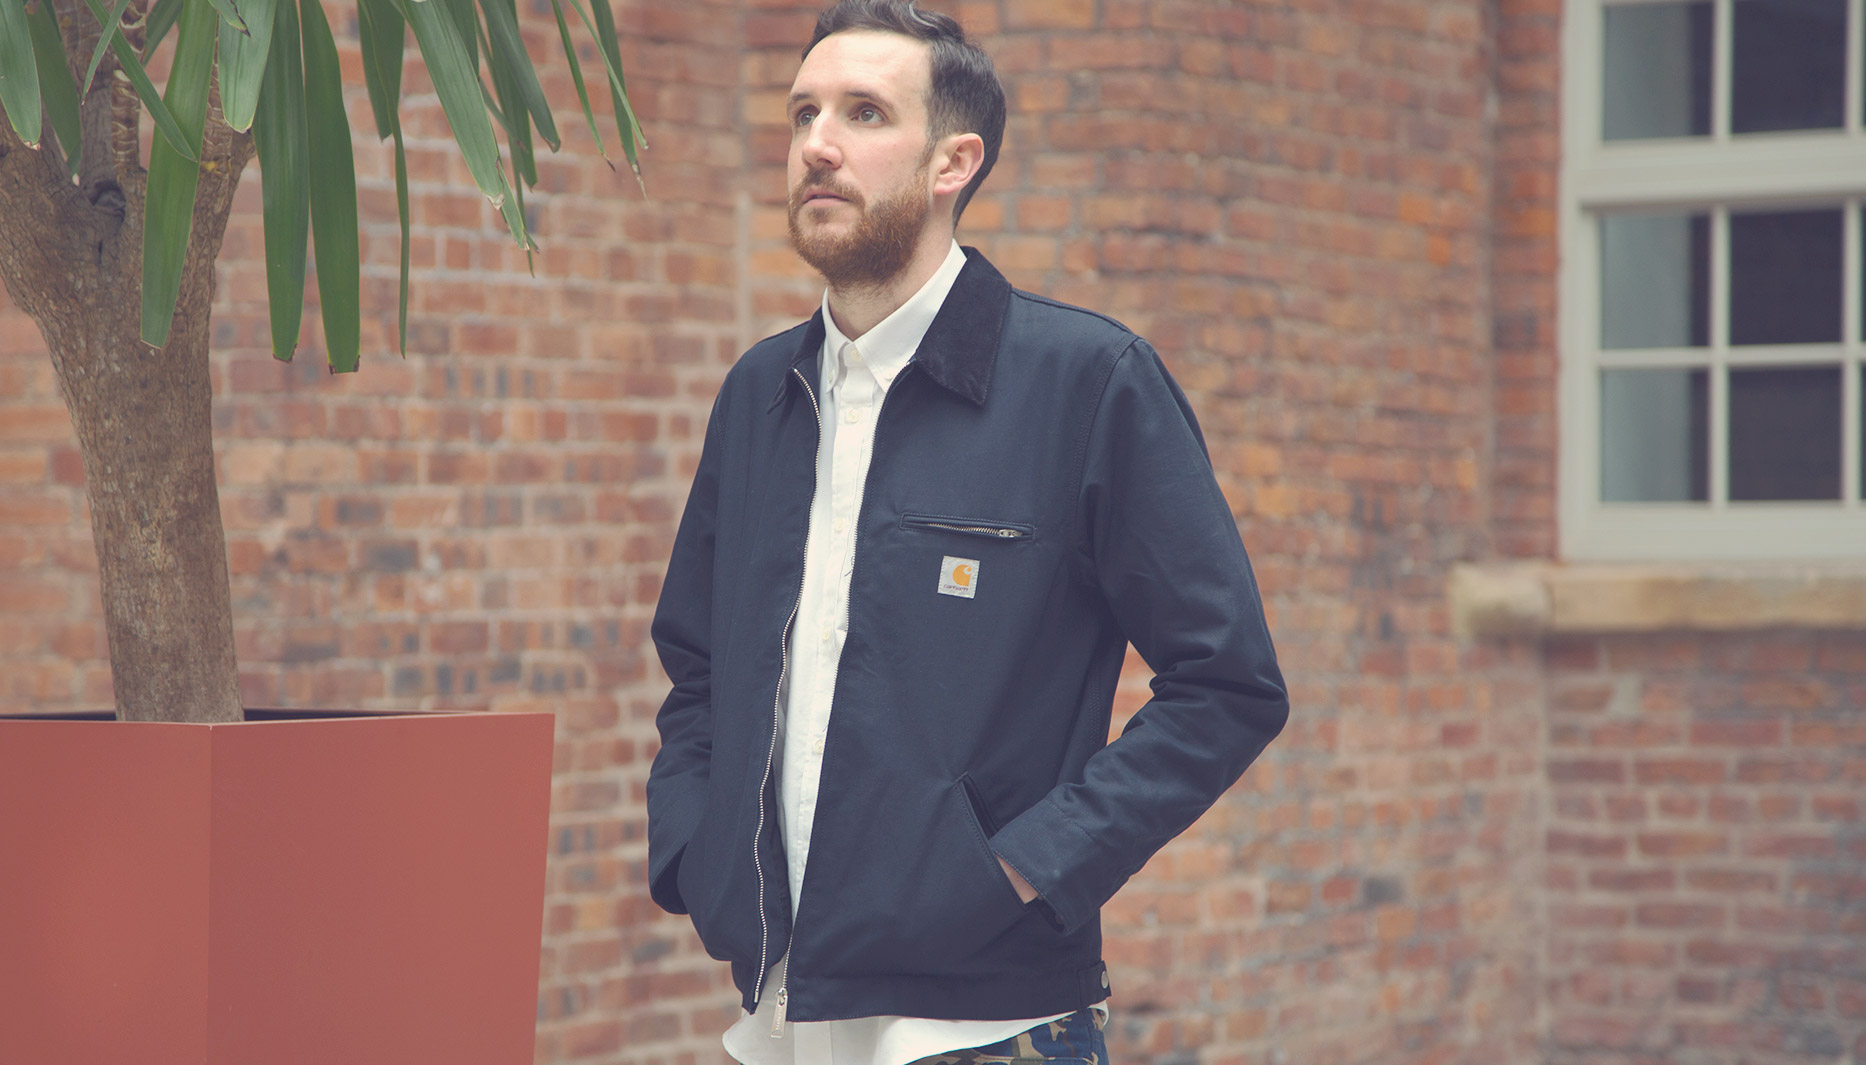 a54de047acbb2 Carhartt Wip Detroit Jacket Size s - Light Jackets for Sale - Grailed